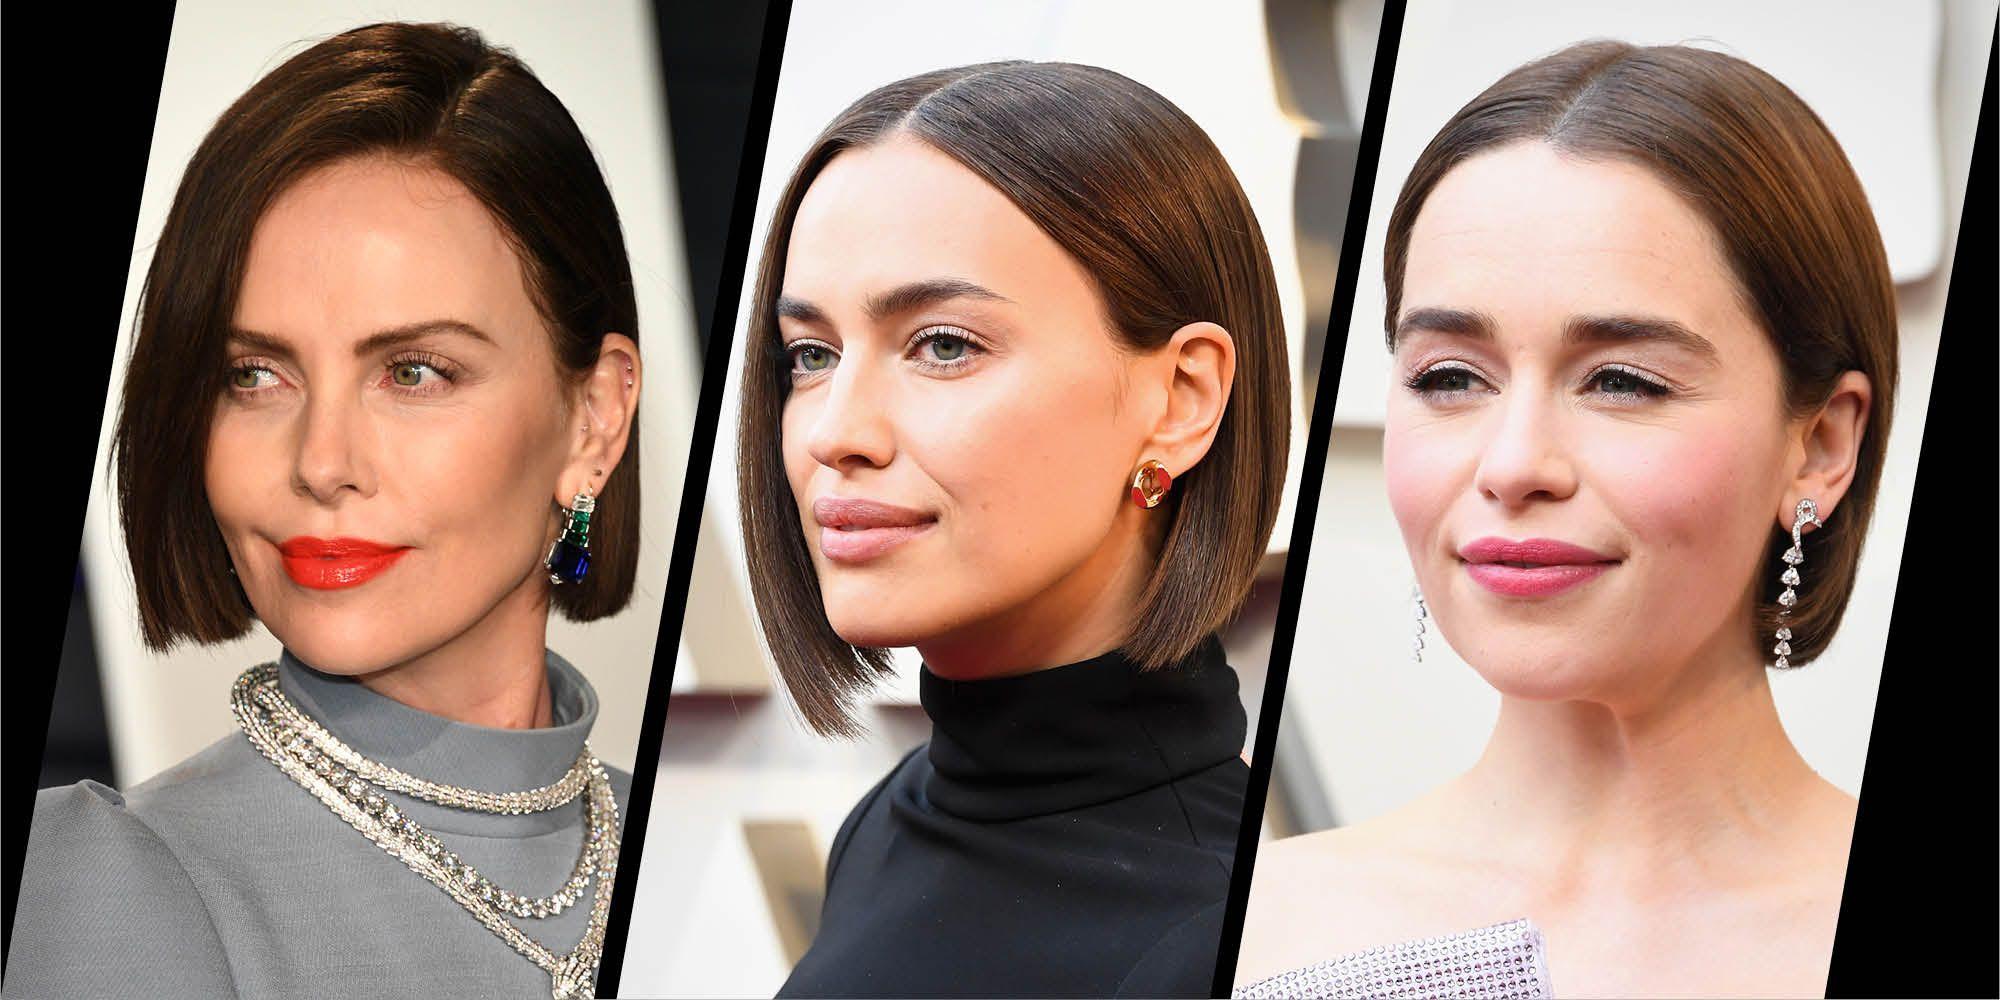 Brunette bobs were trending at the Oscars 2019 - Charlize Theron, Irina Shayk, Emilia Clarke